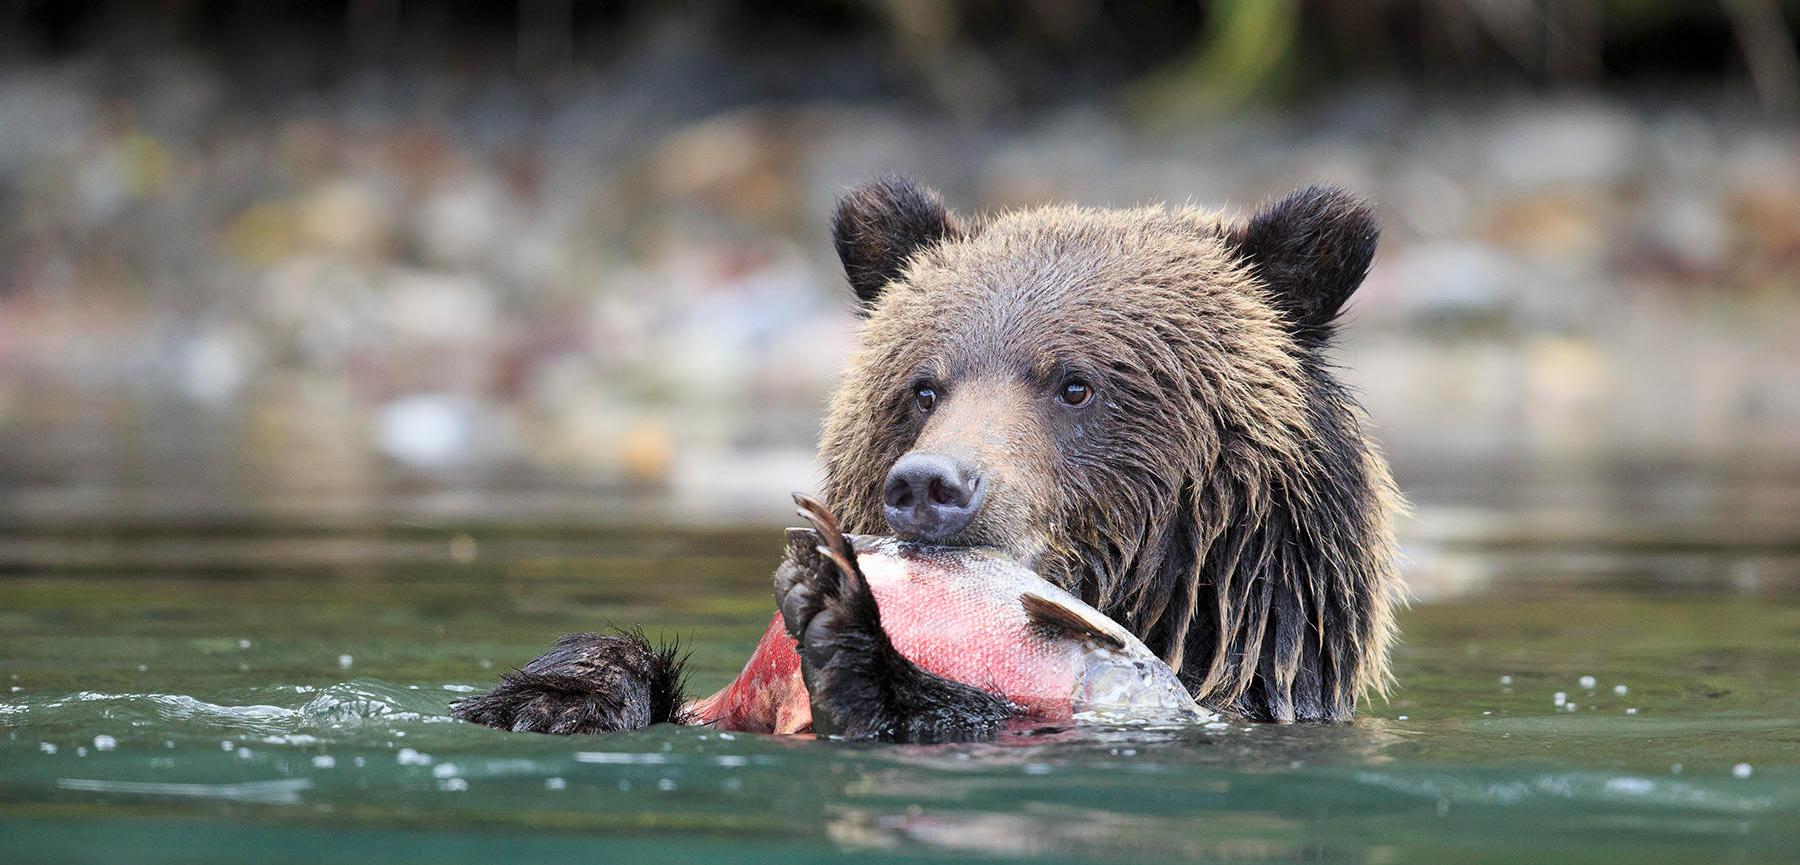 grizzly bead eating a slamon